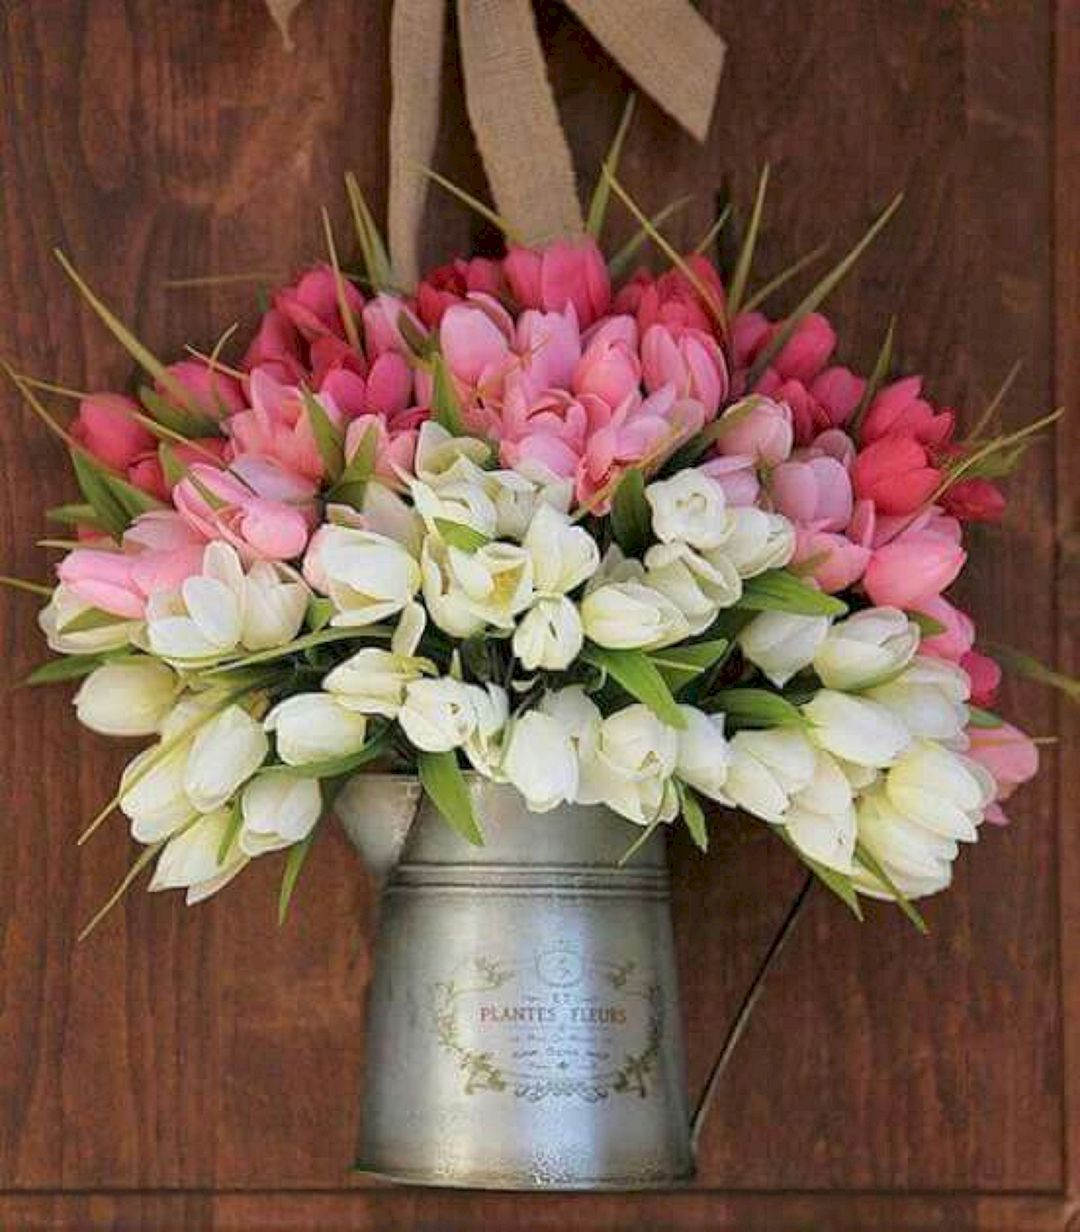 Inspiring 40+ Stunning and Easy DIY Tulip Arrangement Ideas https://decoor.net/40-stunning-and-easy-diy-tulip-arrangement-ideas-346/